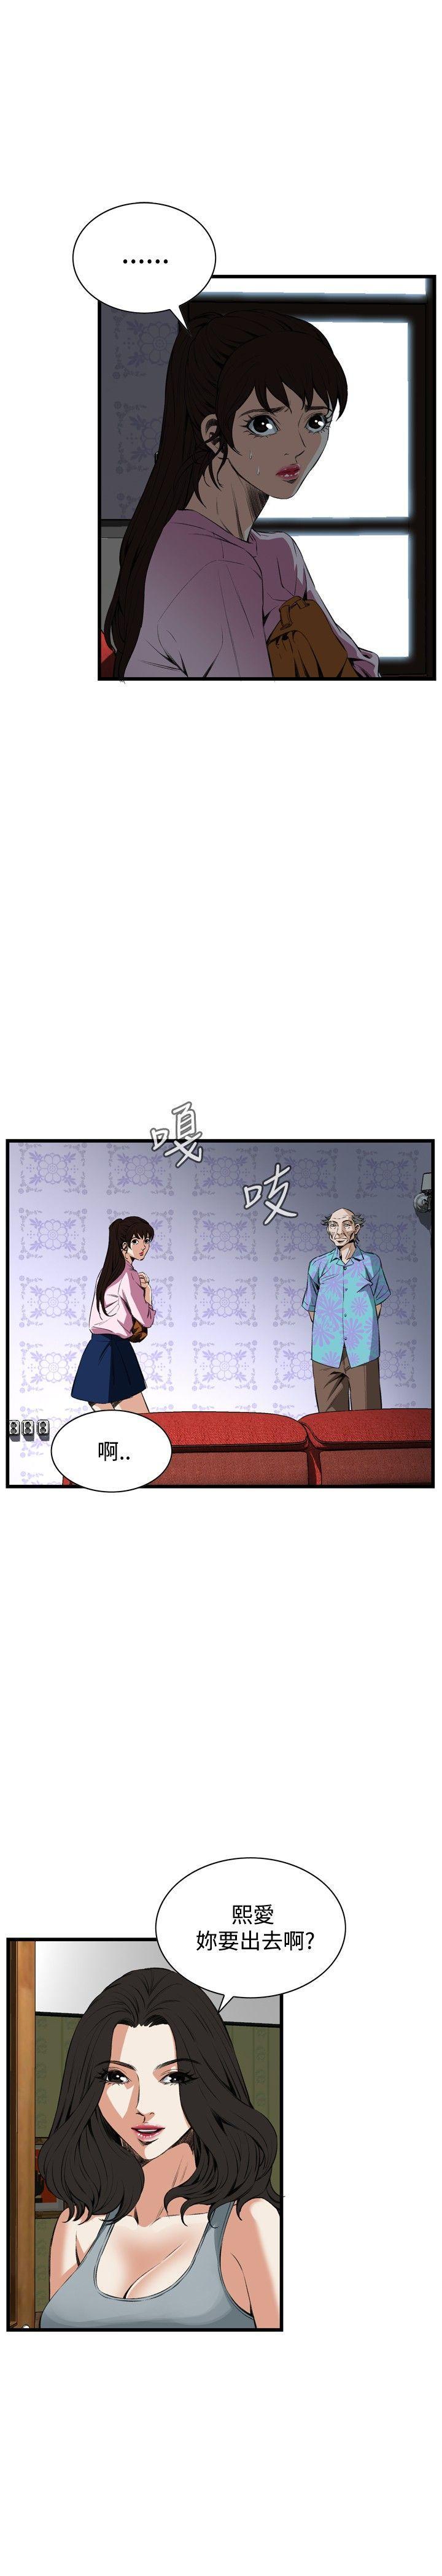 Take a Peek 偷窥 Ch.39~60 [Chinese]中文 501